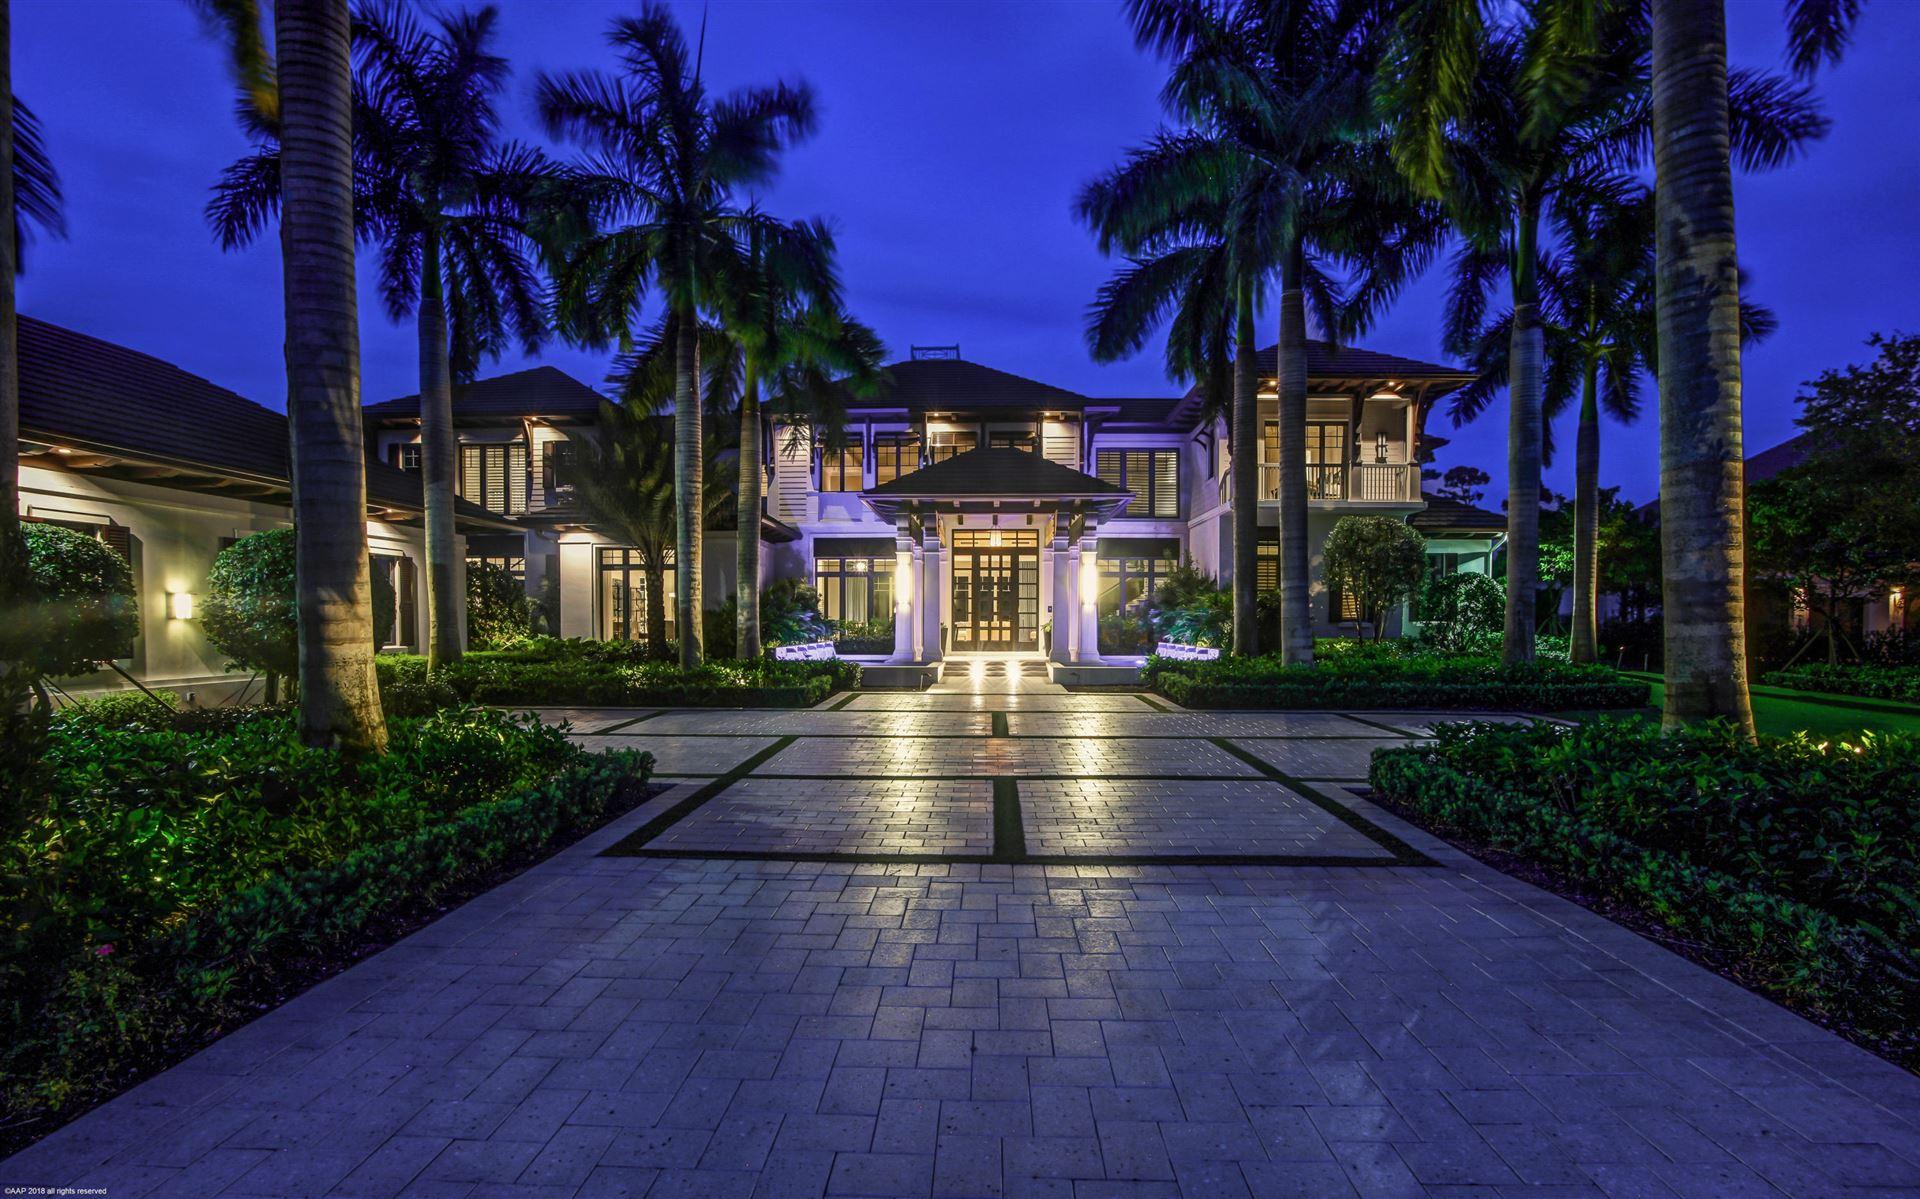 12218 Tillinghast, Palm Beach Gardens, 33418 Photo 1